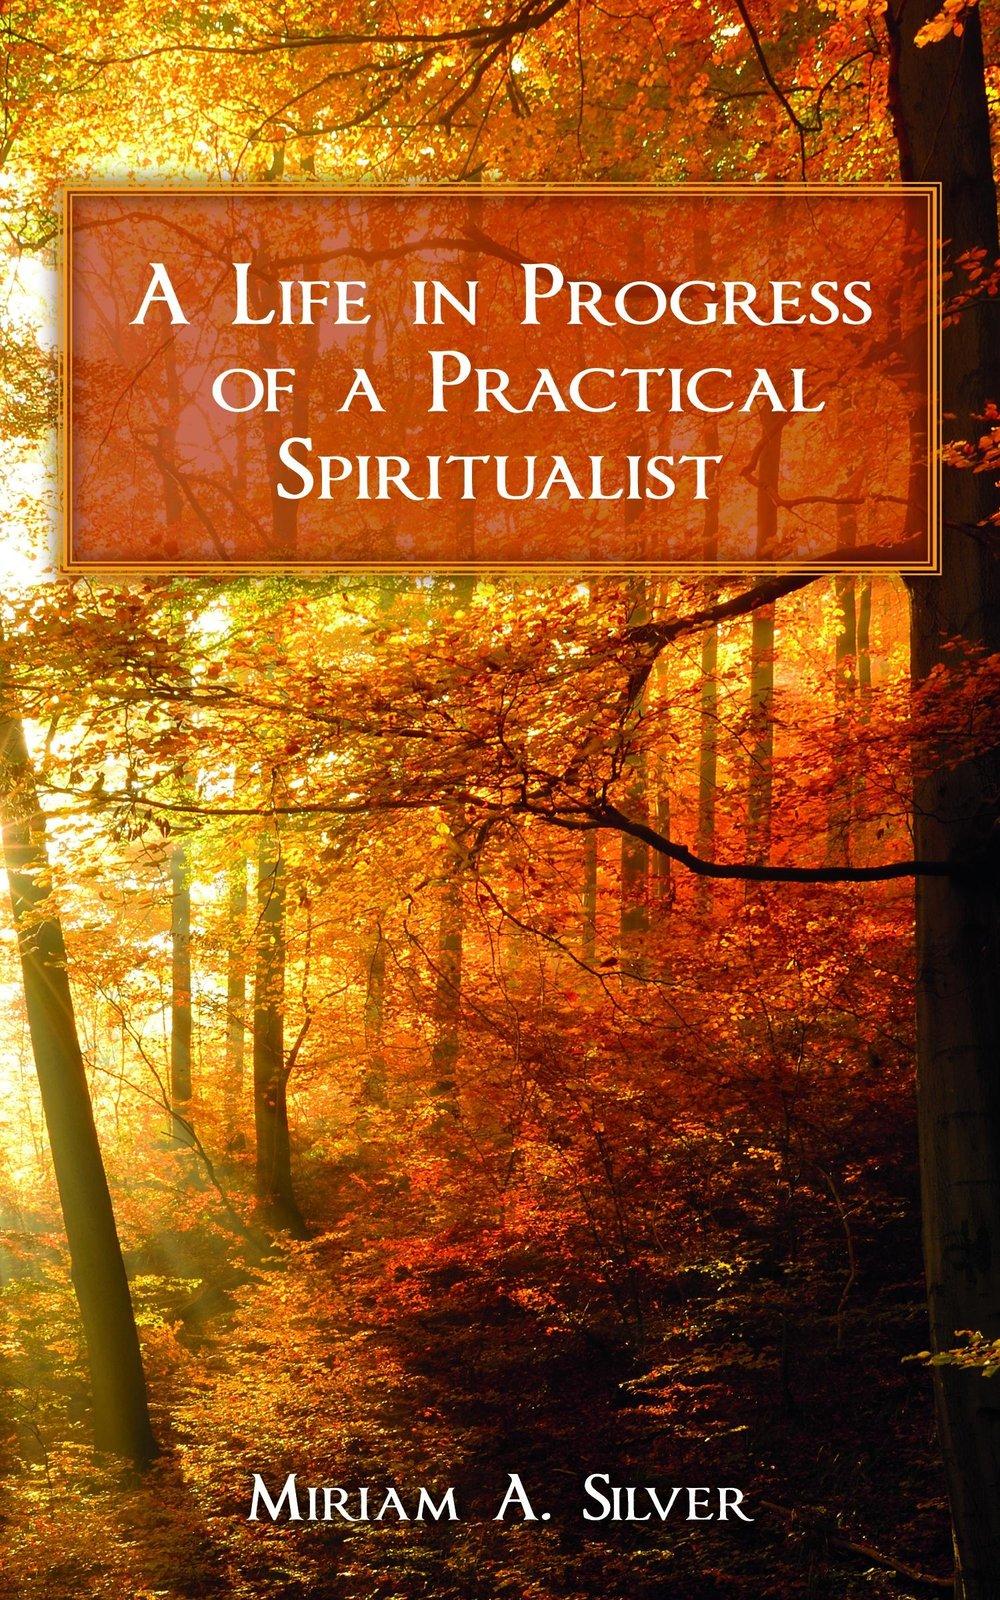 A personal memoir of a spiritual journey.